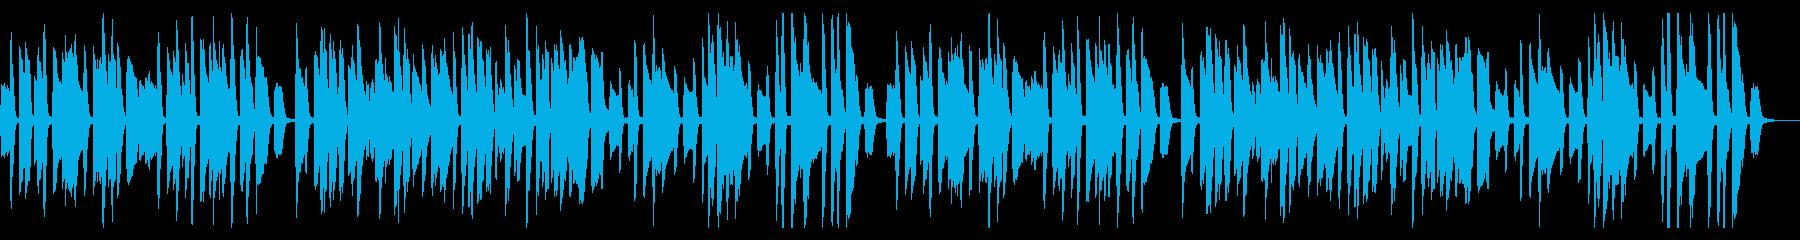 YouTube・コミカル・トーク・ピアノの再生済みの波形